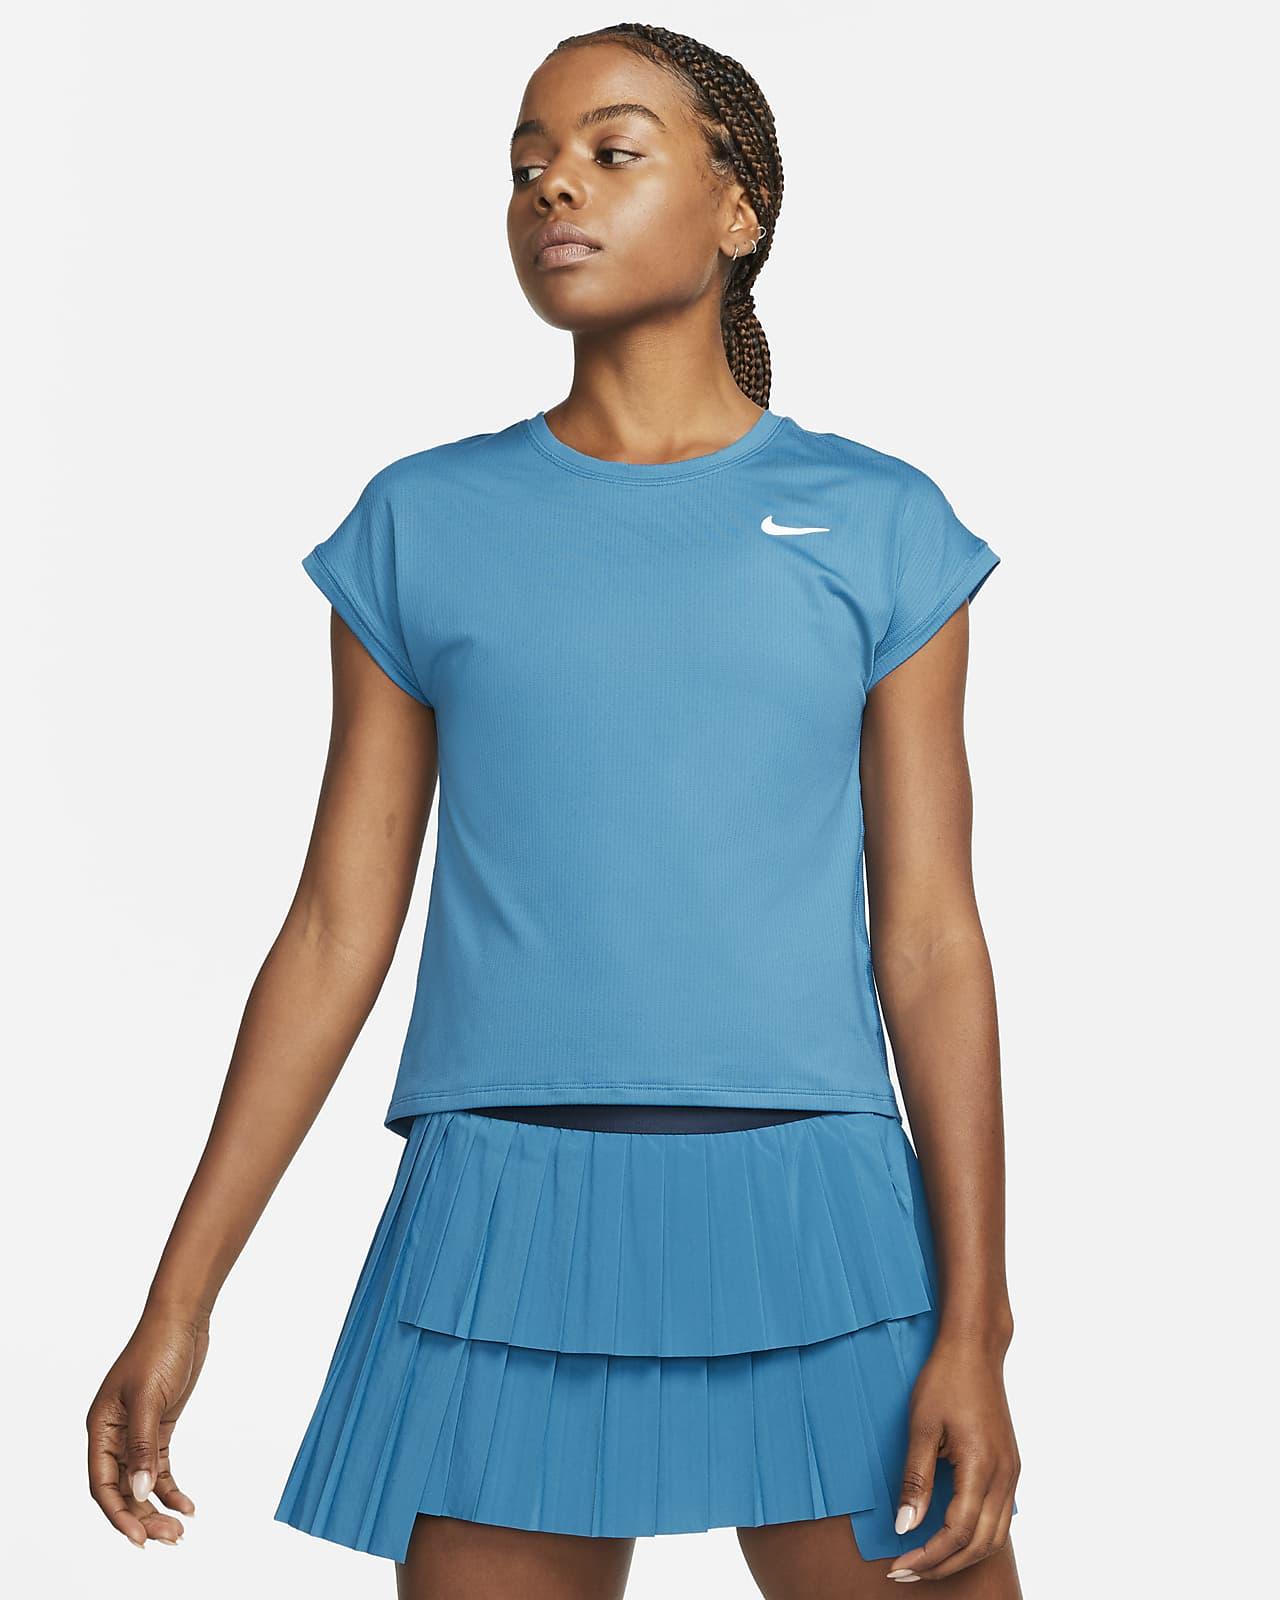 NikeCourt Dri-FIT Victory Women's Short-Sleeve Tennis Top